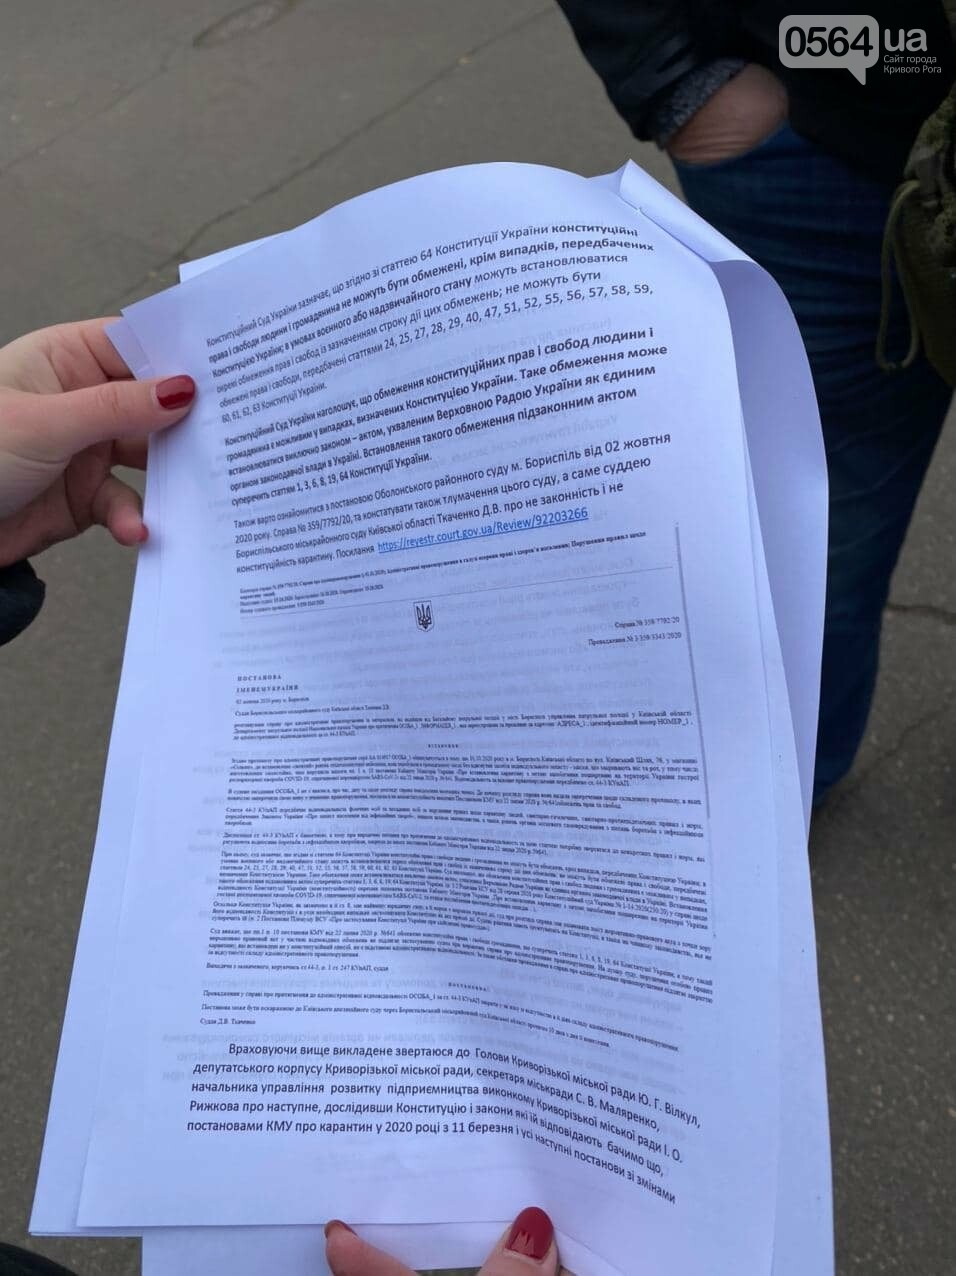 Представители малого бизнеса продолжили протест возле мэрии Кривого Рога, - ФОТО, ВИДЕО, фото-7